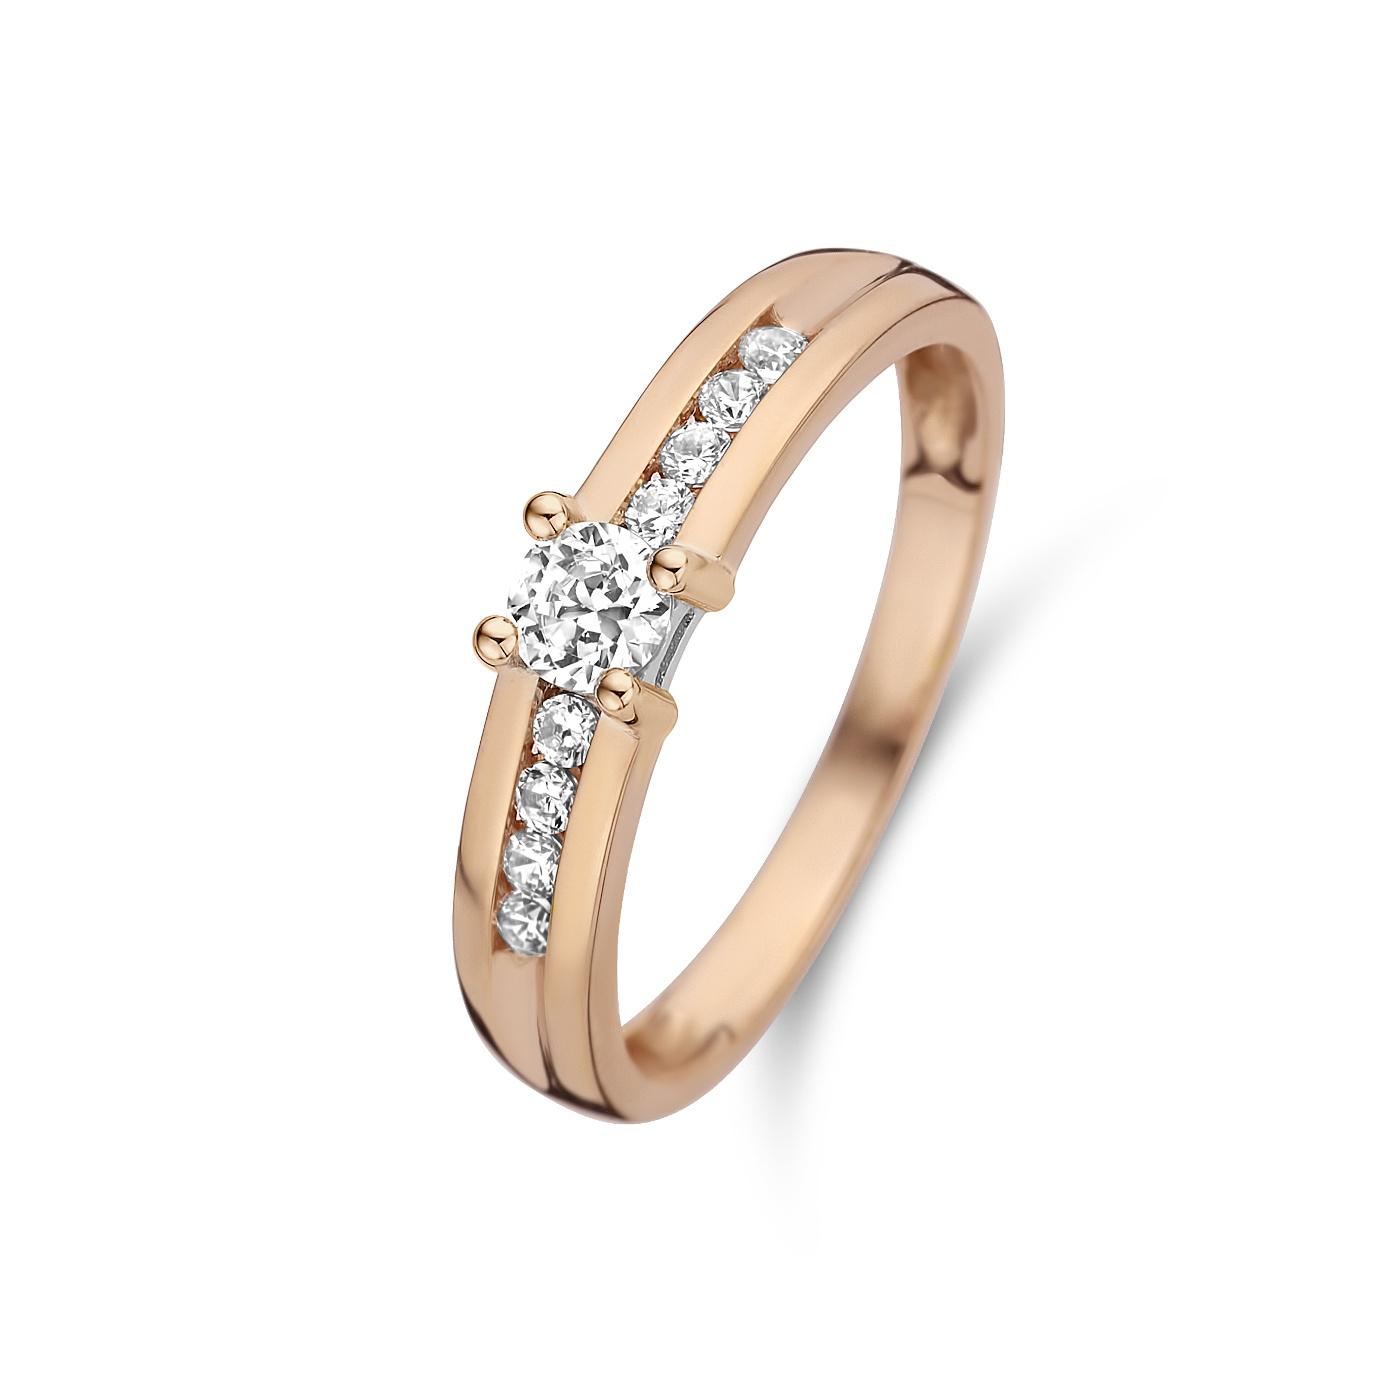 Isabel Bernard La Concorde Lou-Anne 14 Karat roségoldener Ring Zirkonia